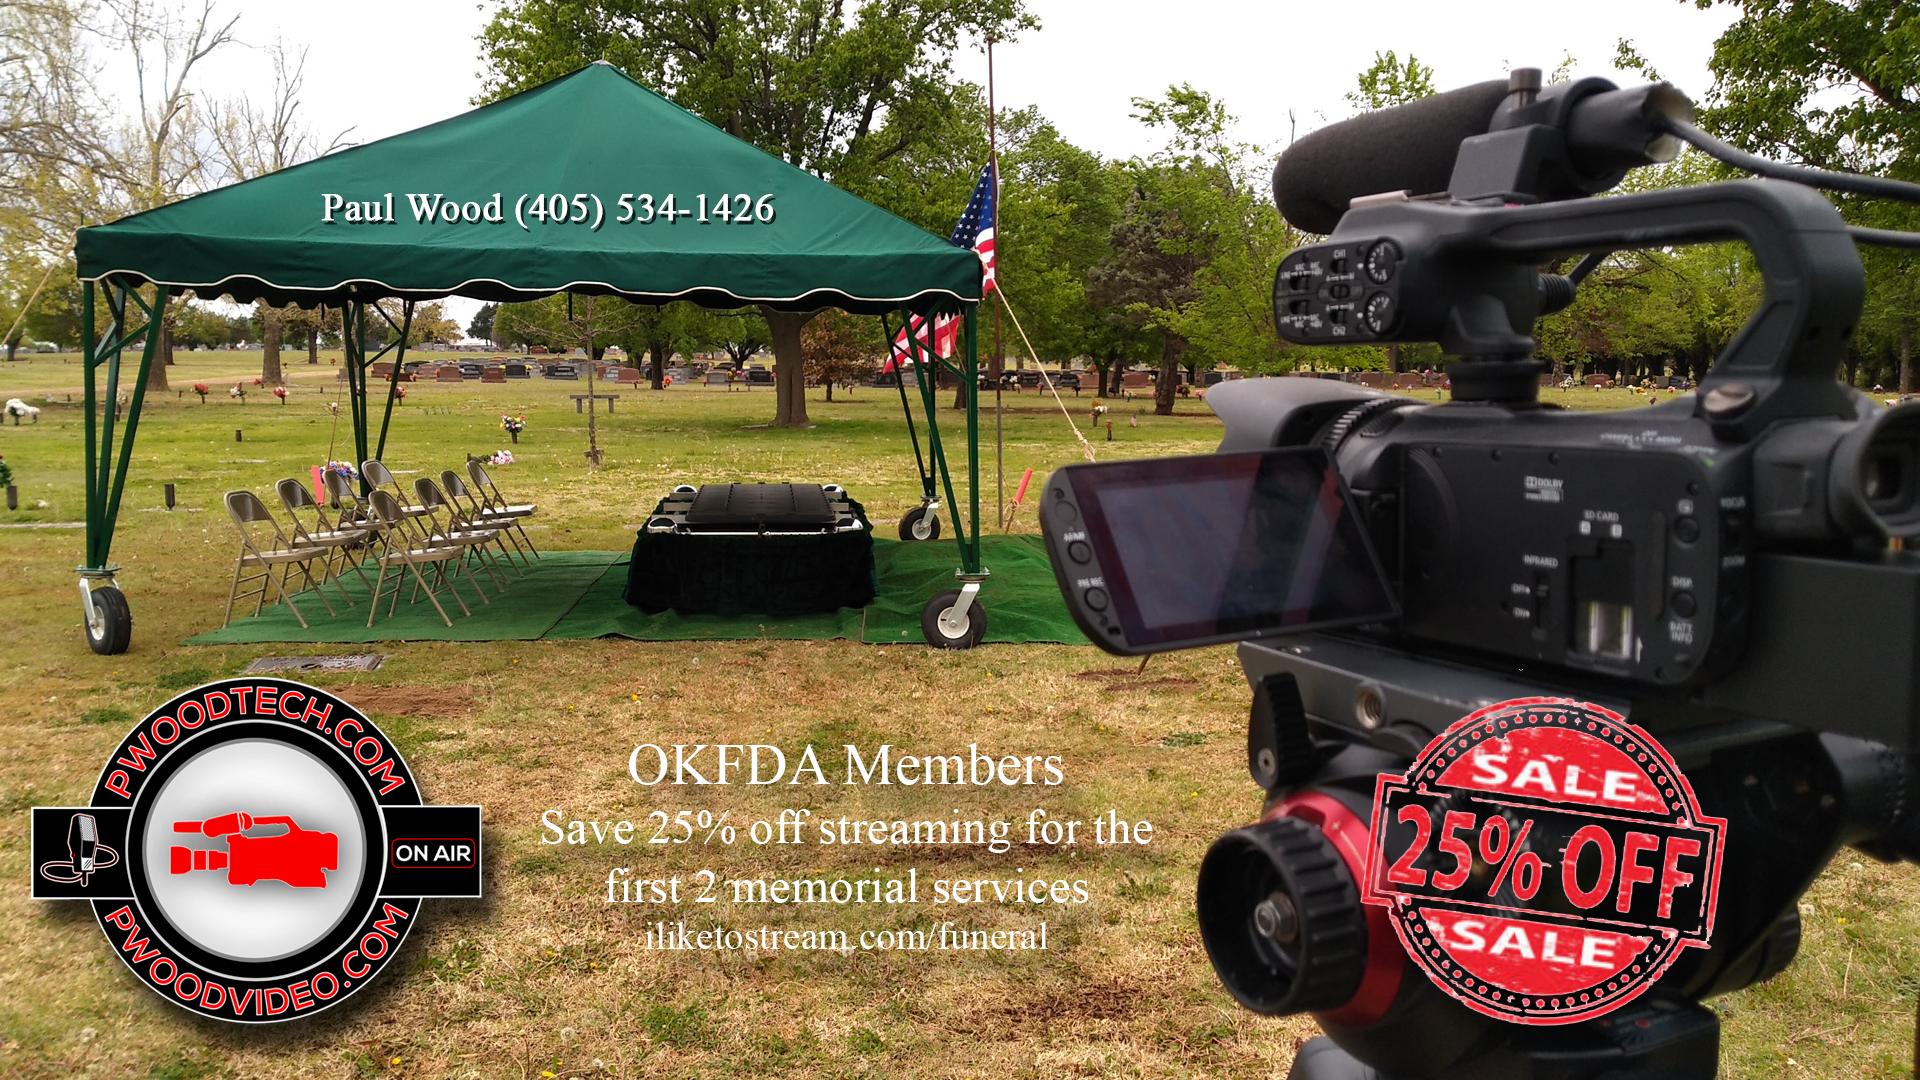 25% off for OKFDA